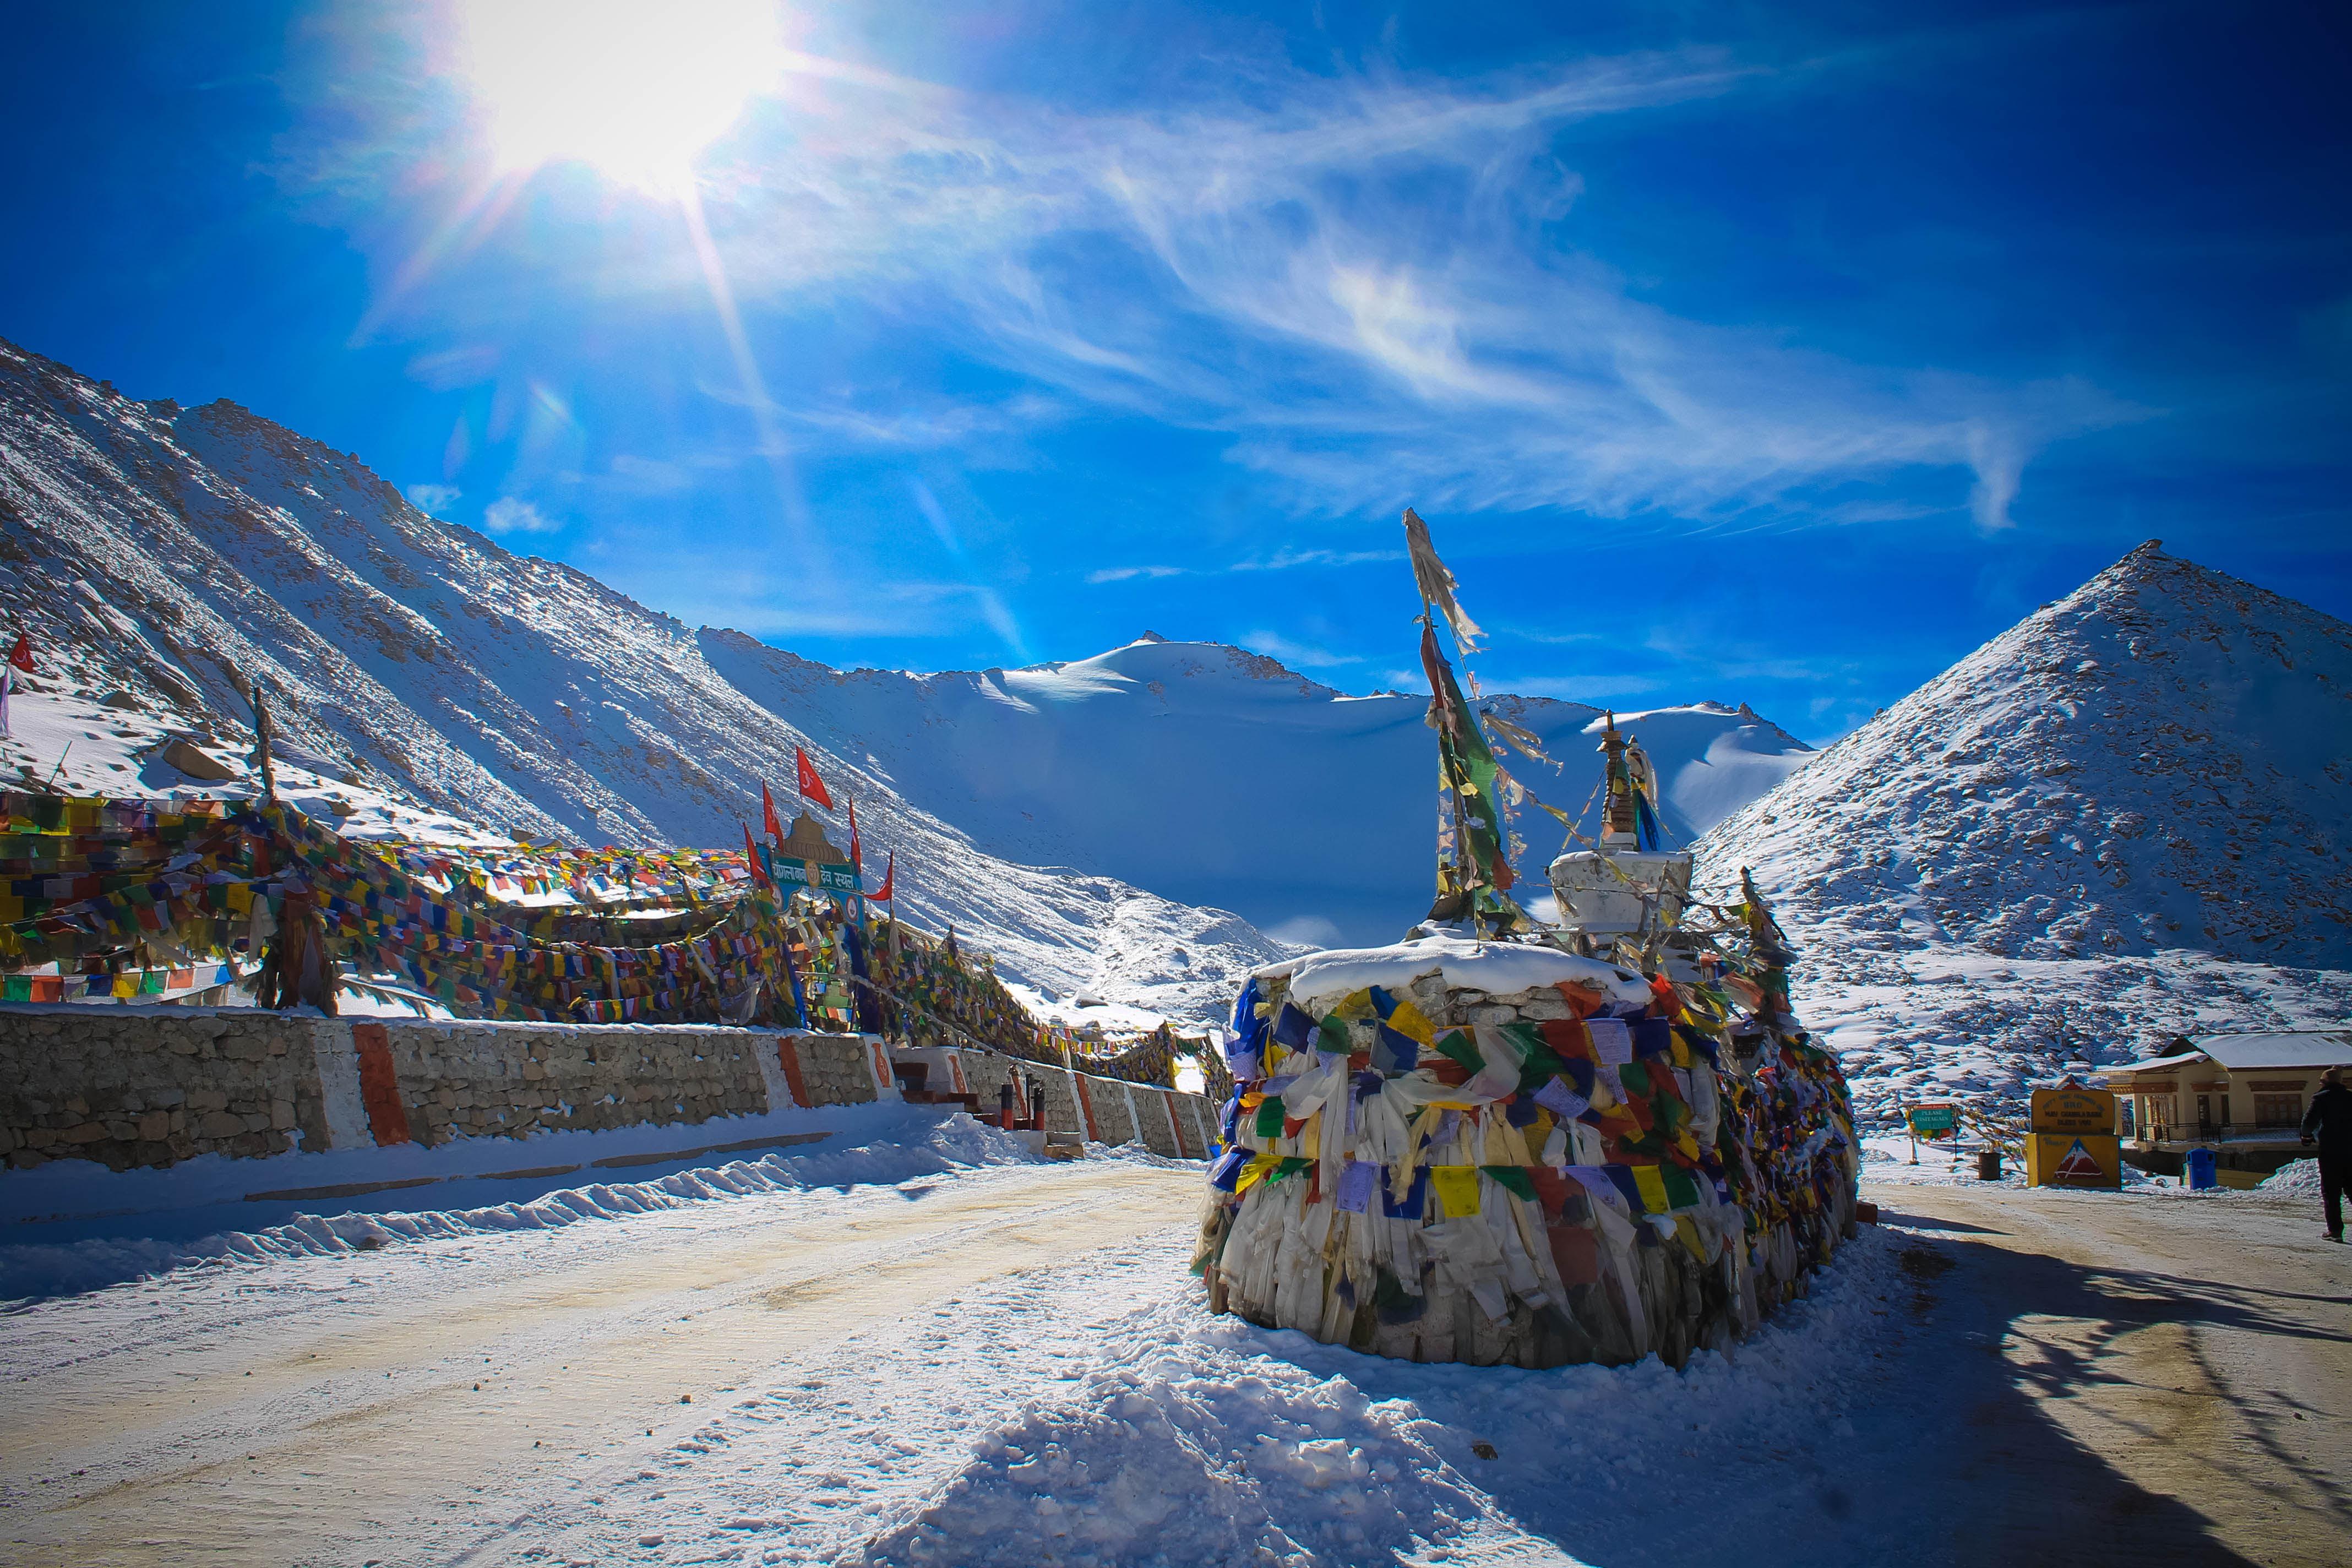 Leh Ladakh Incredible Place of India - Leh Ladakh Tour Package from Delhi